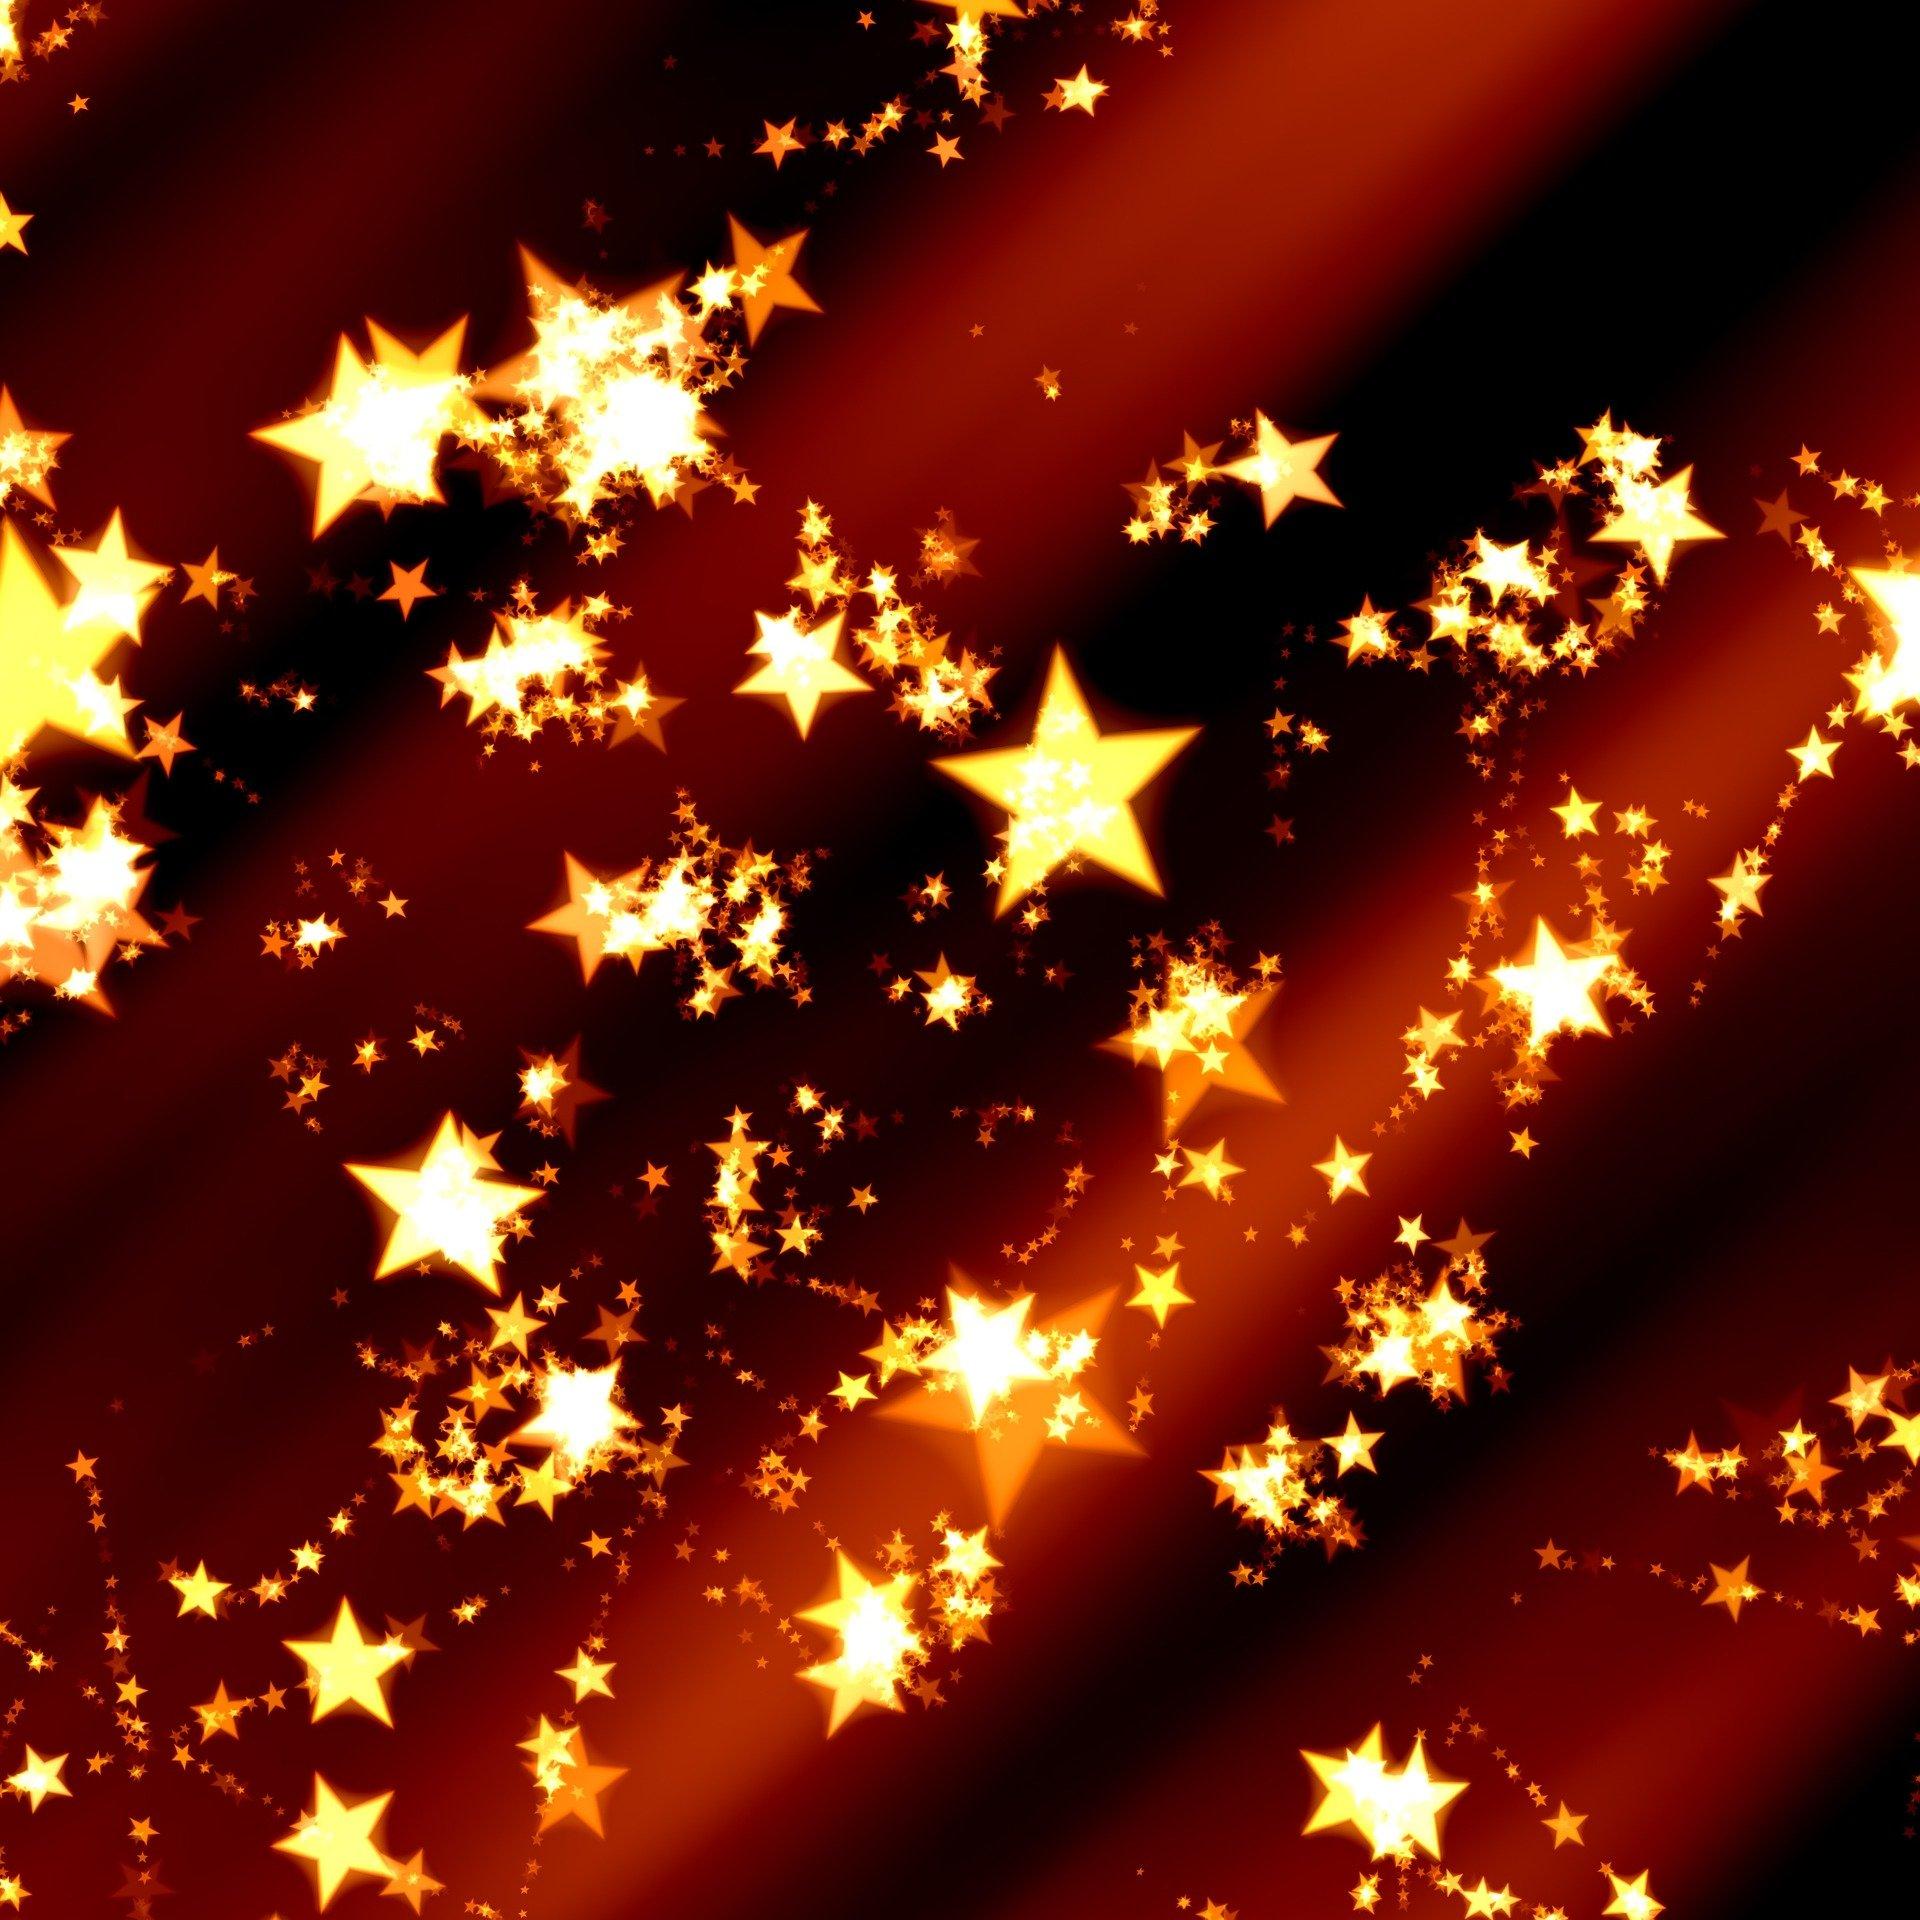 star-875759_1920